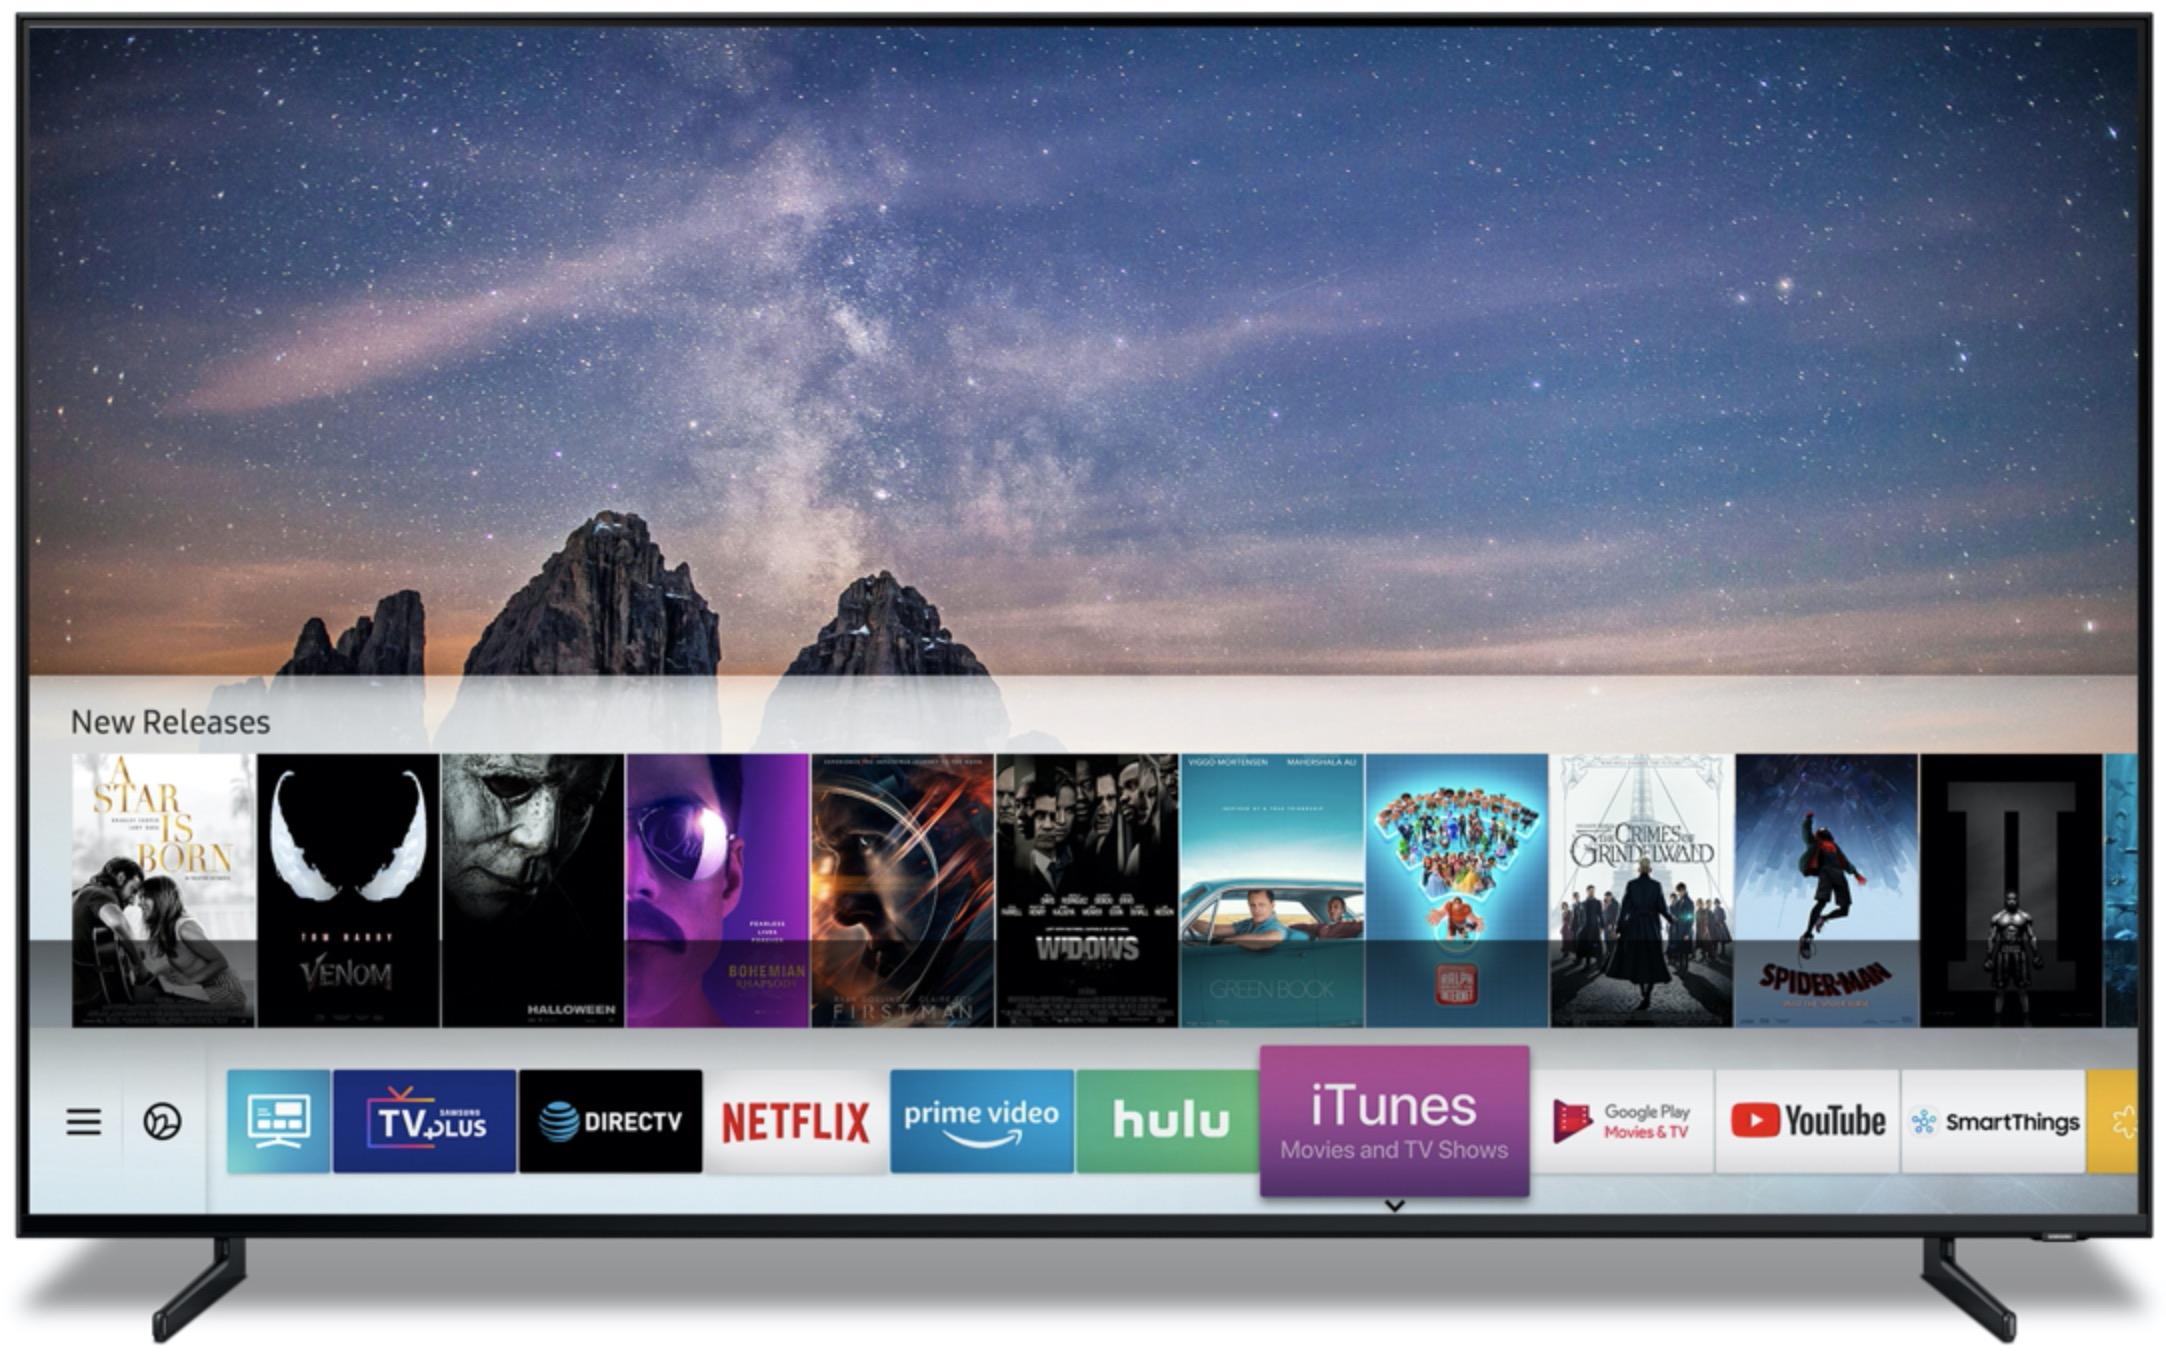 How do i mirror my ipad to samsung smart tv